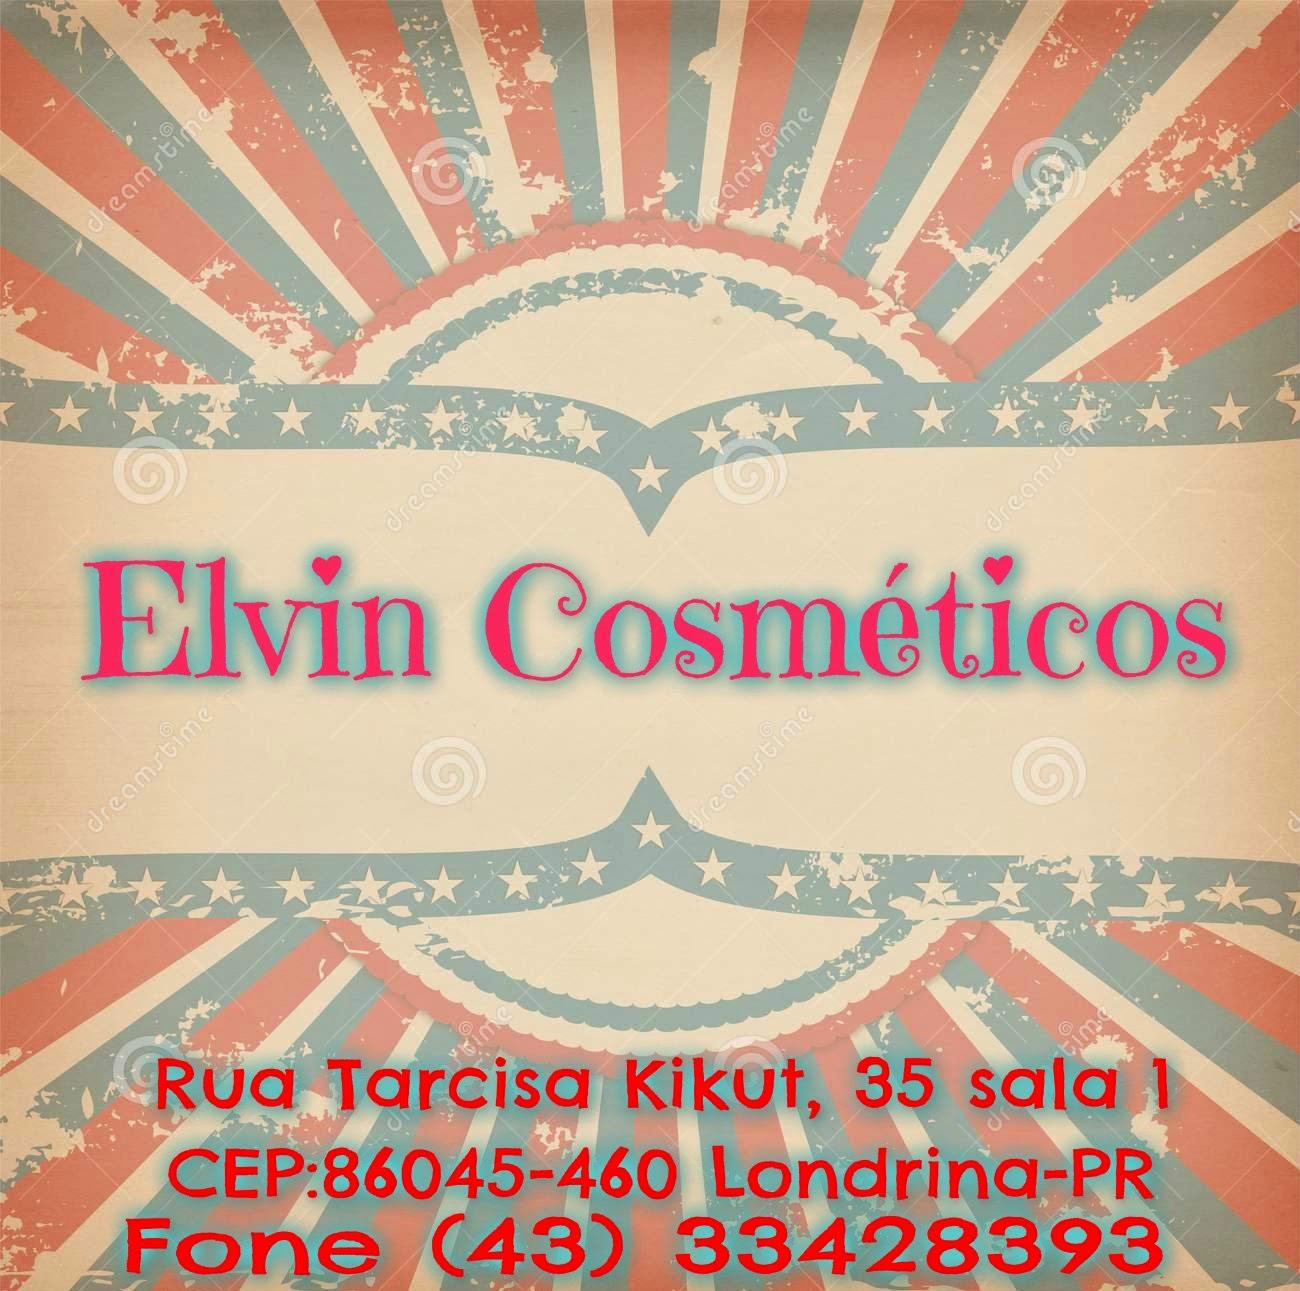 Elvin Cosméticos